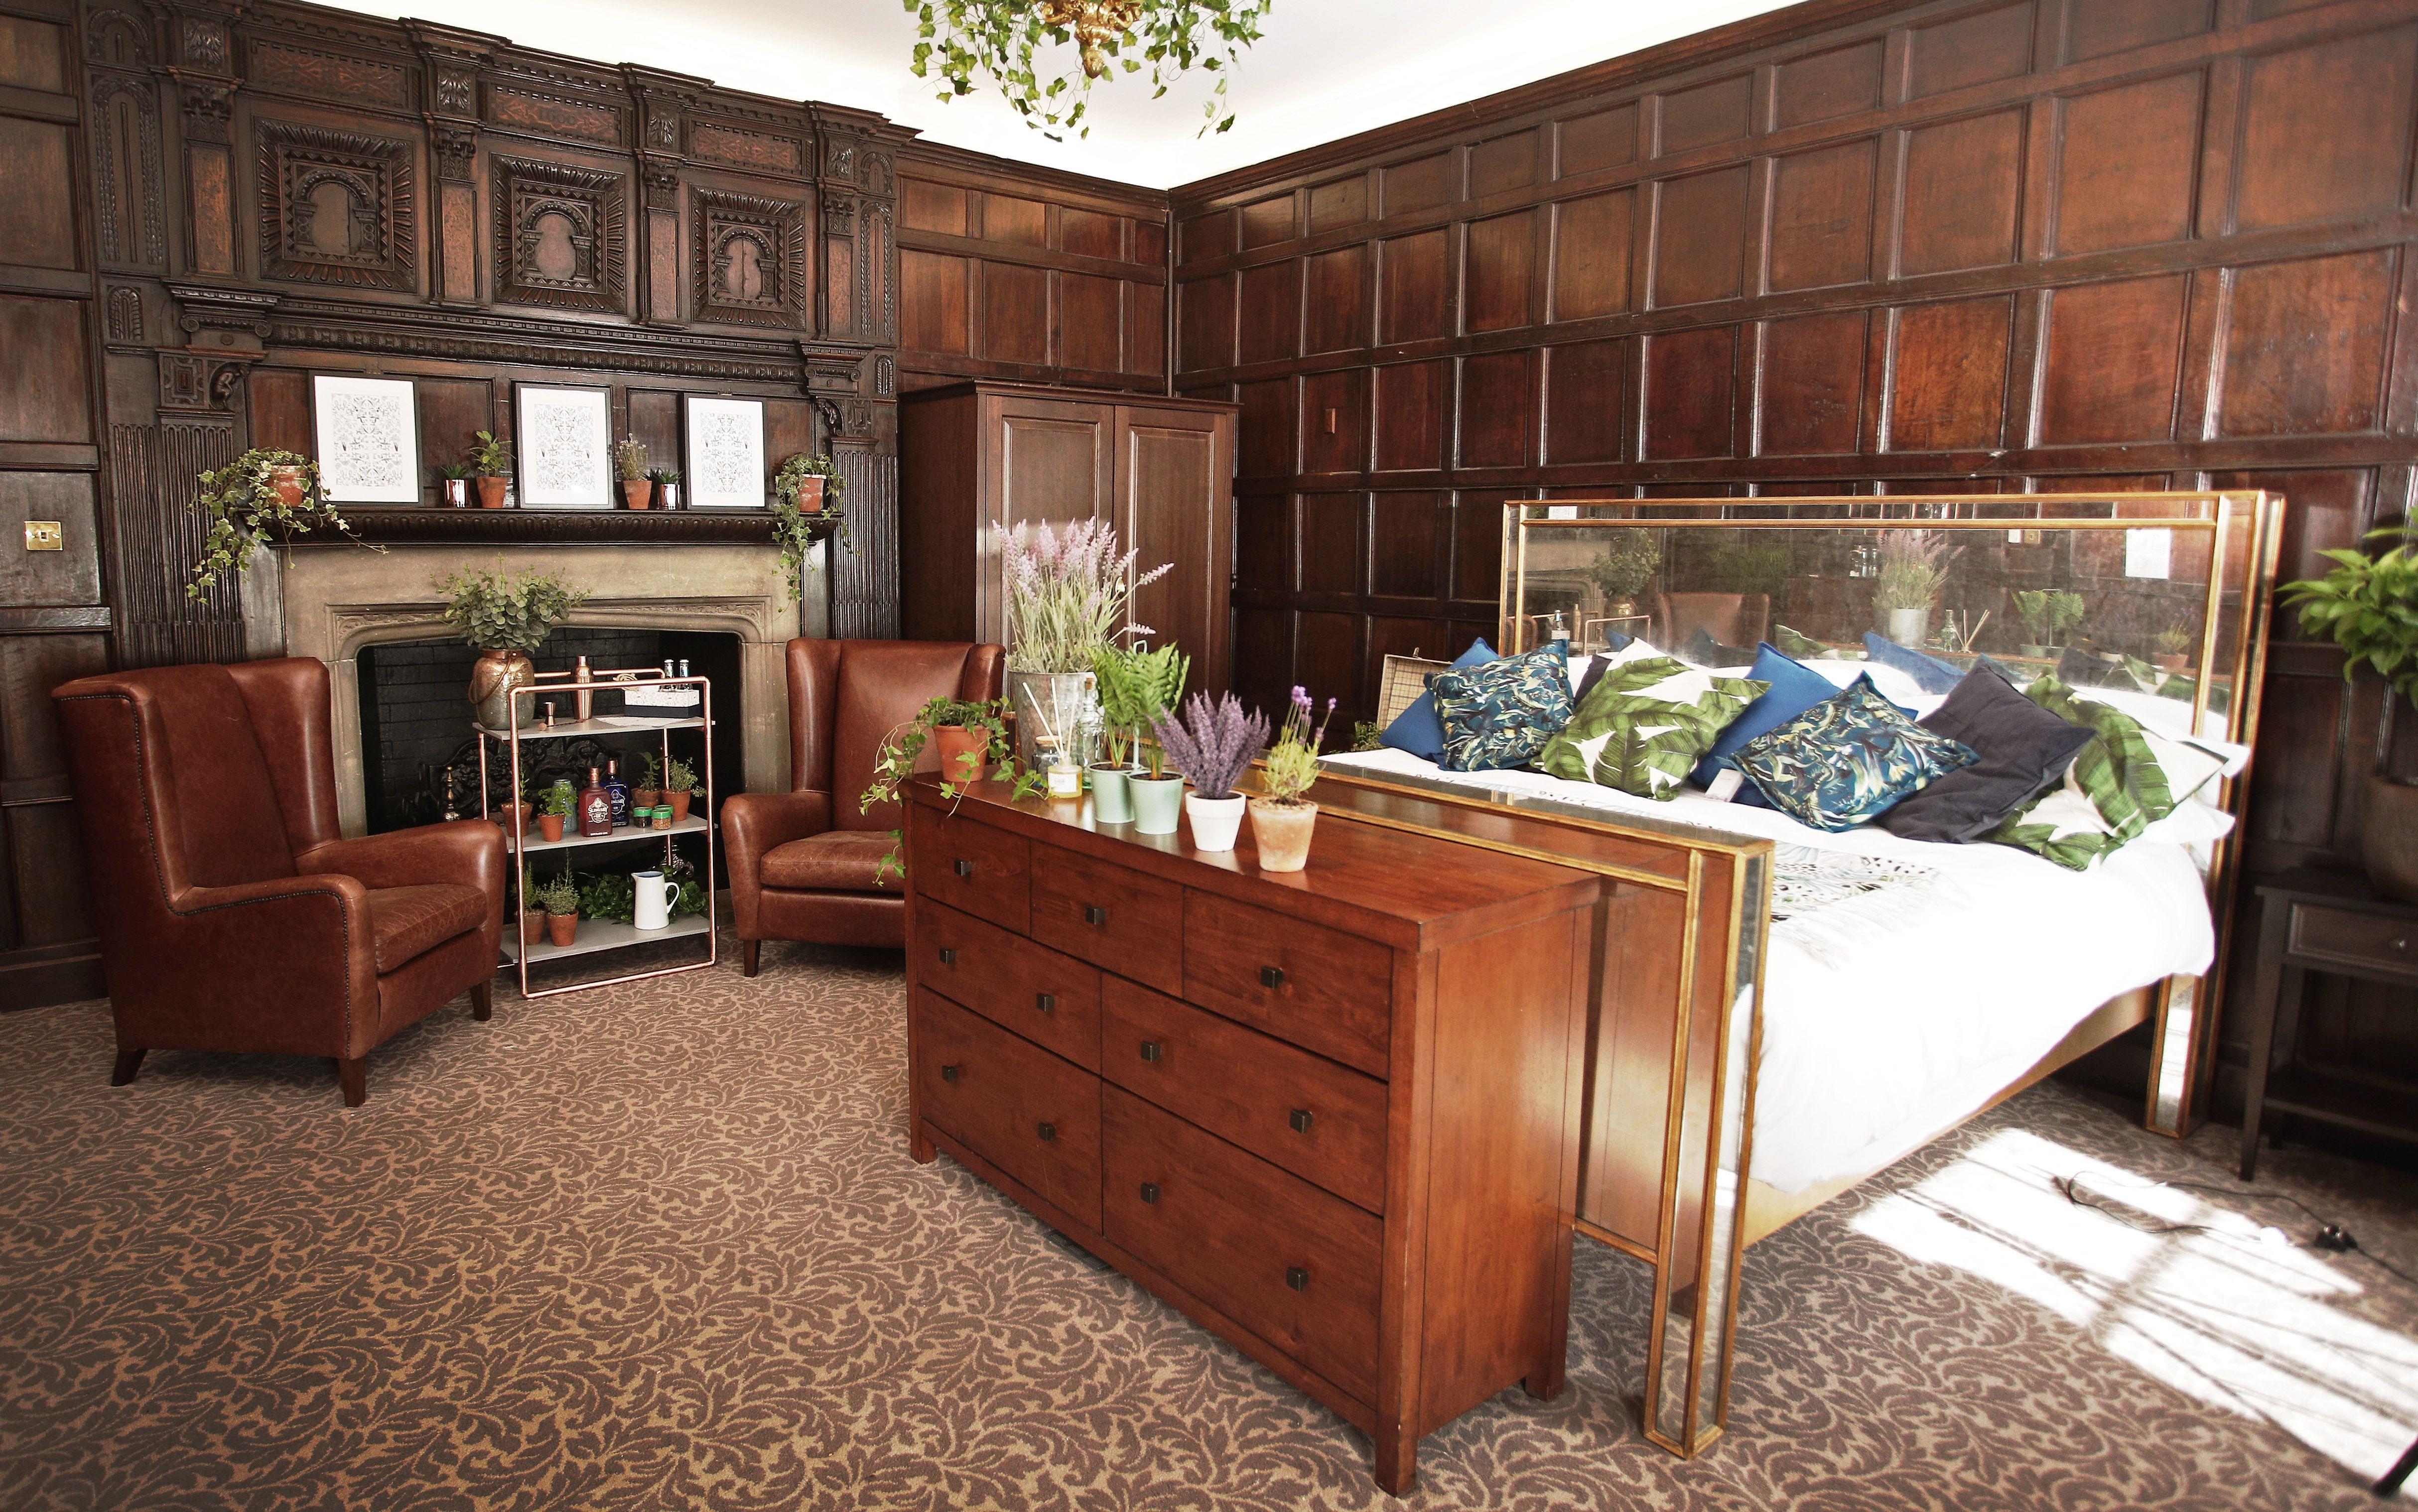 Slingsby Ginspiration Suites at Hotel du Vin in Wimbledon